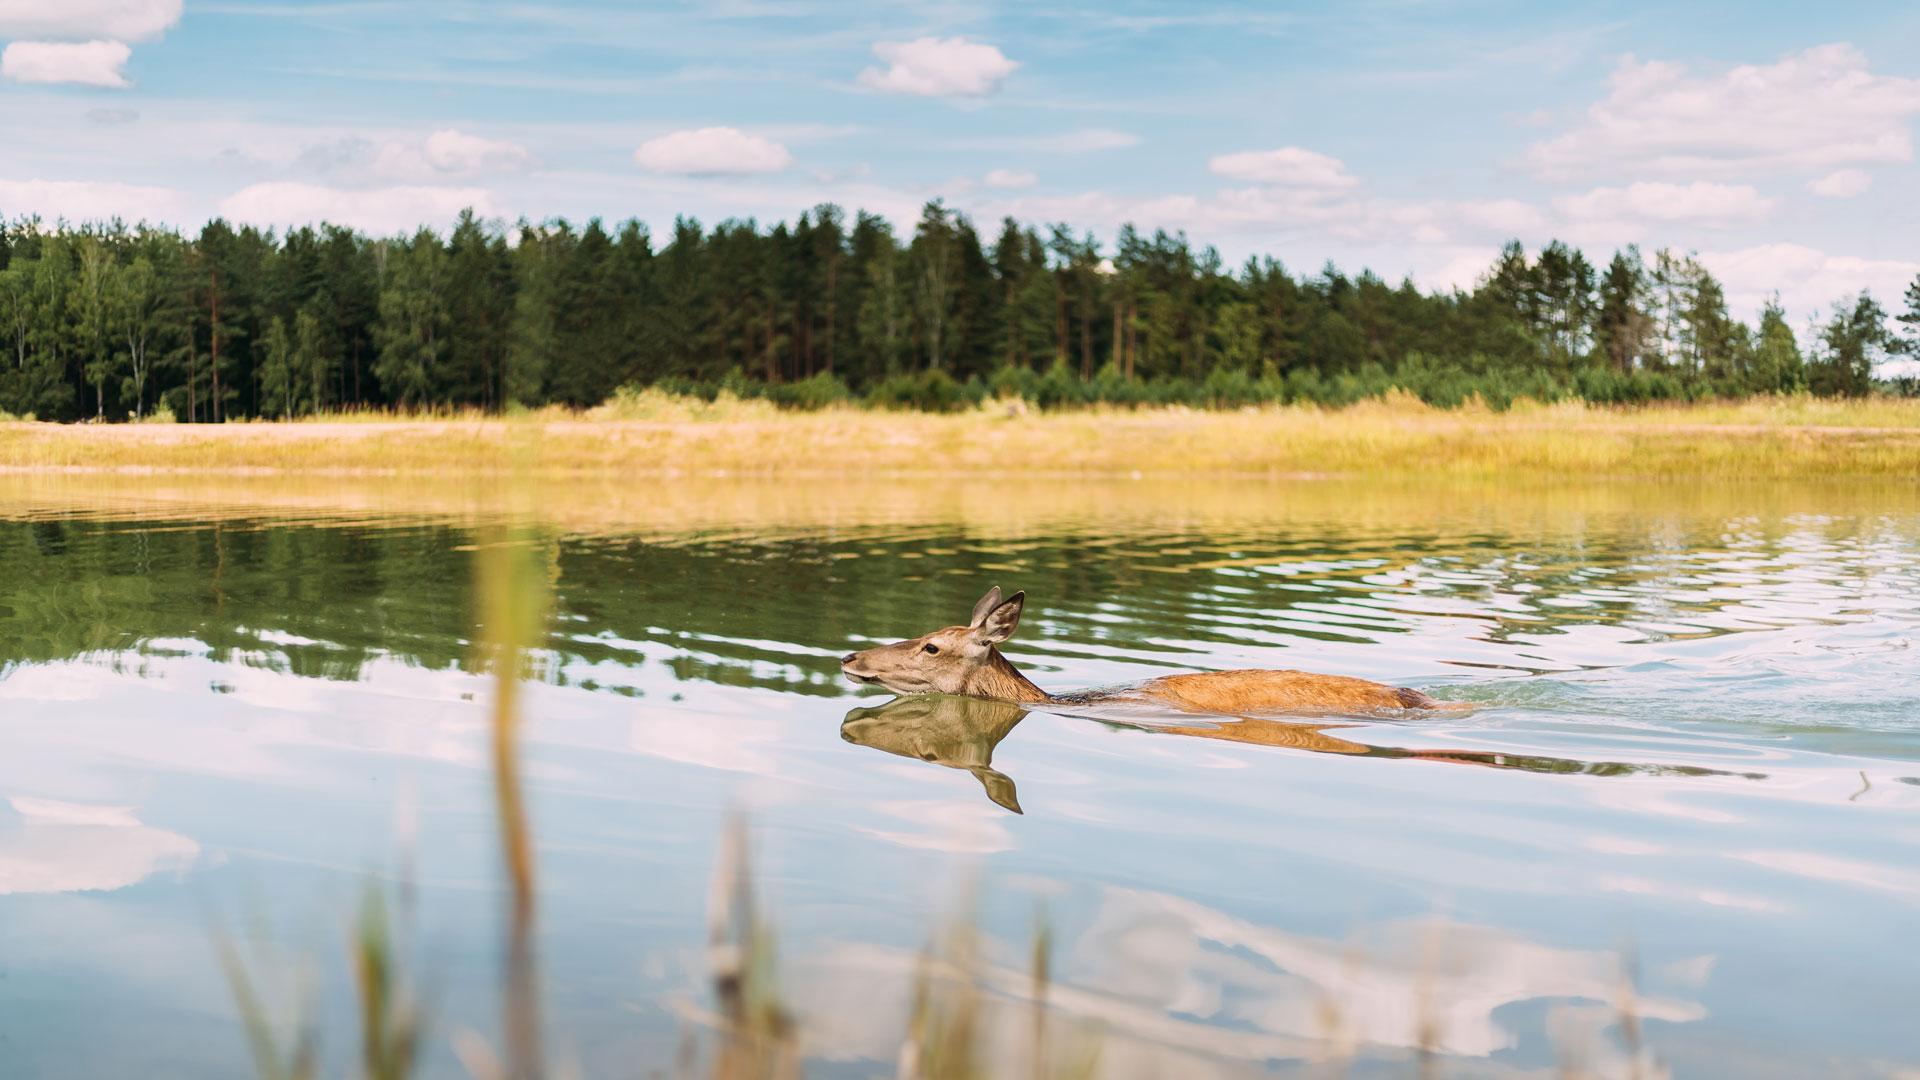 Tiere Hitze: Reh im Fluss